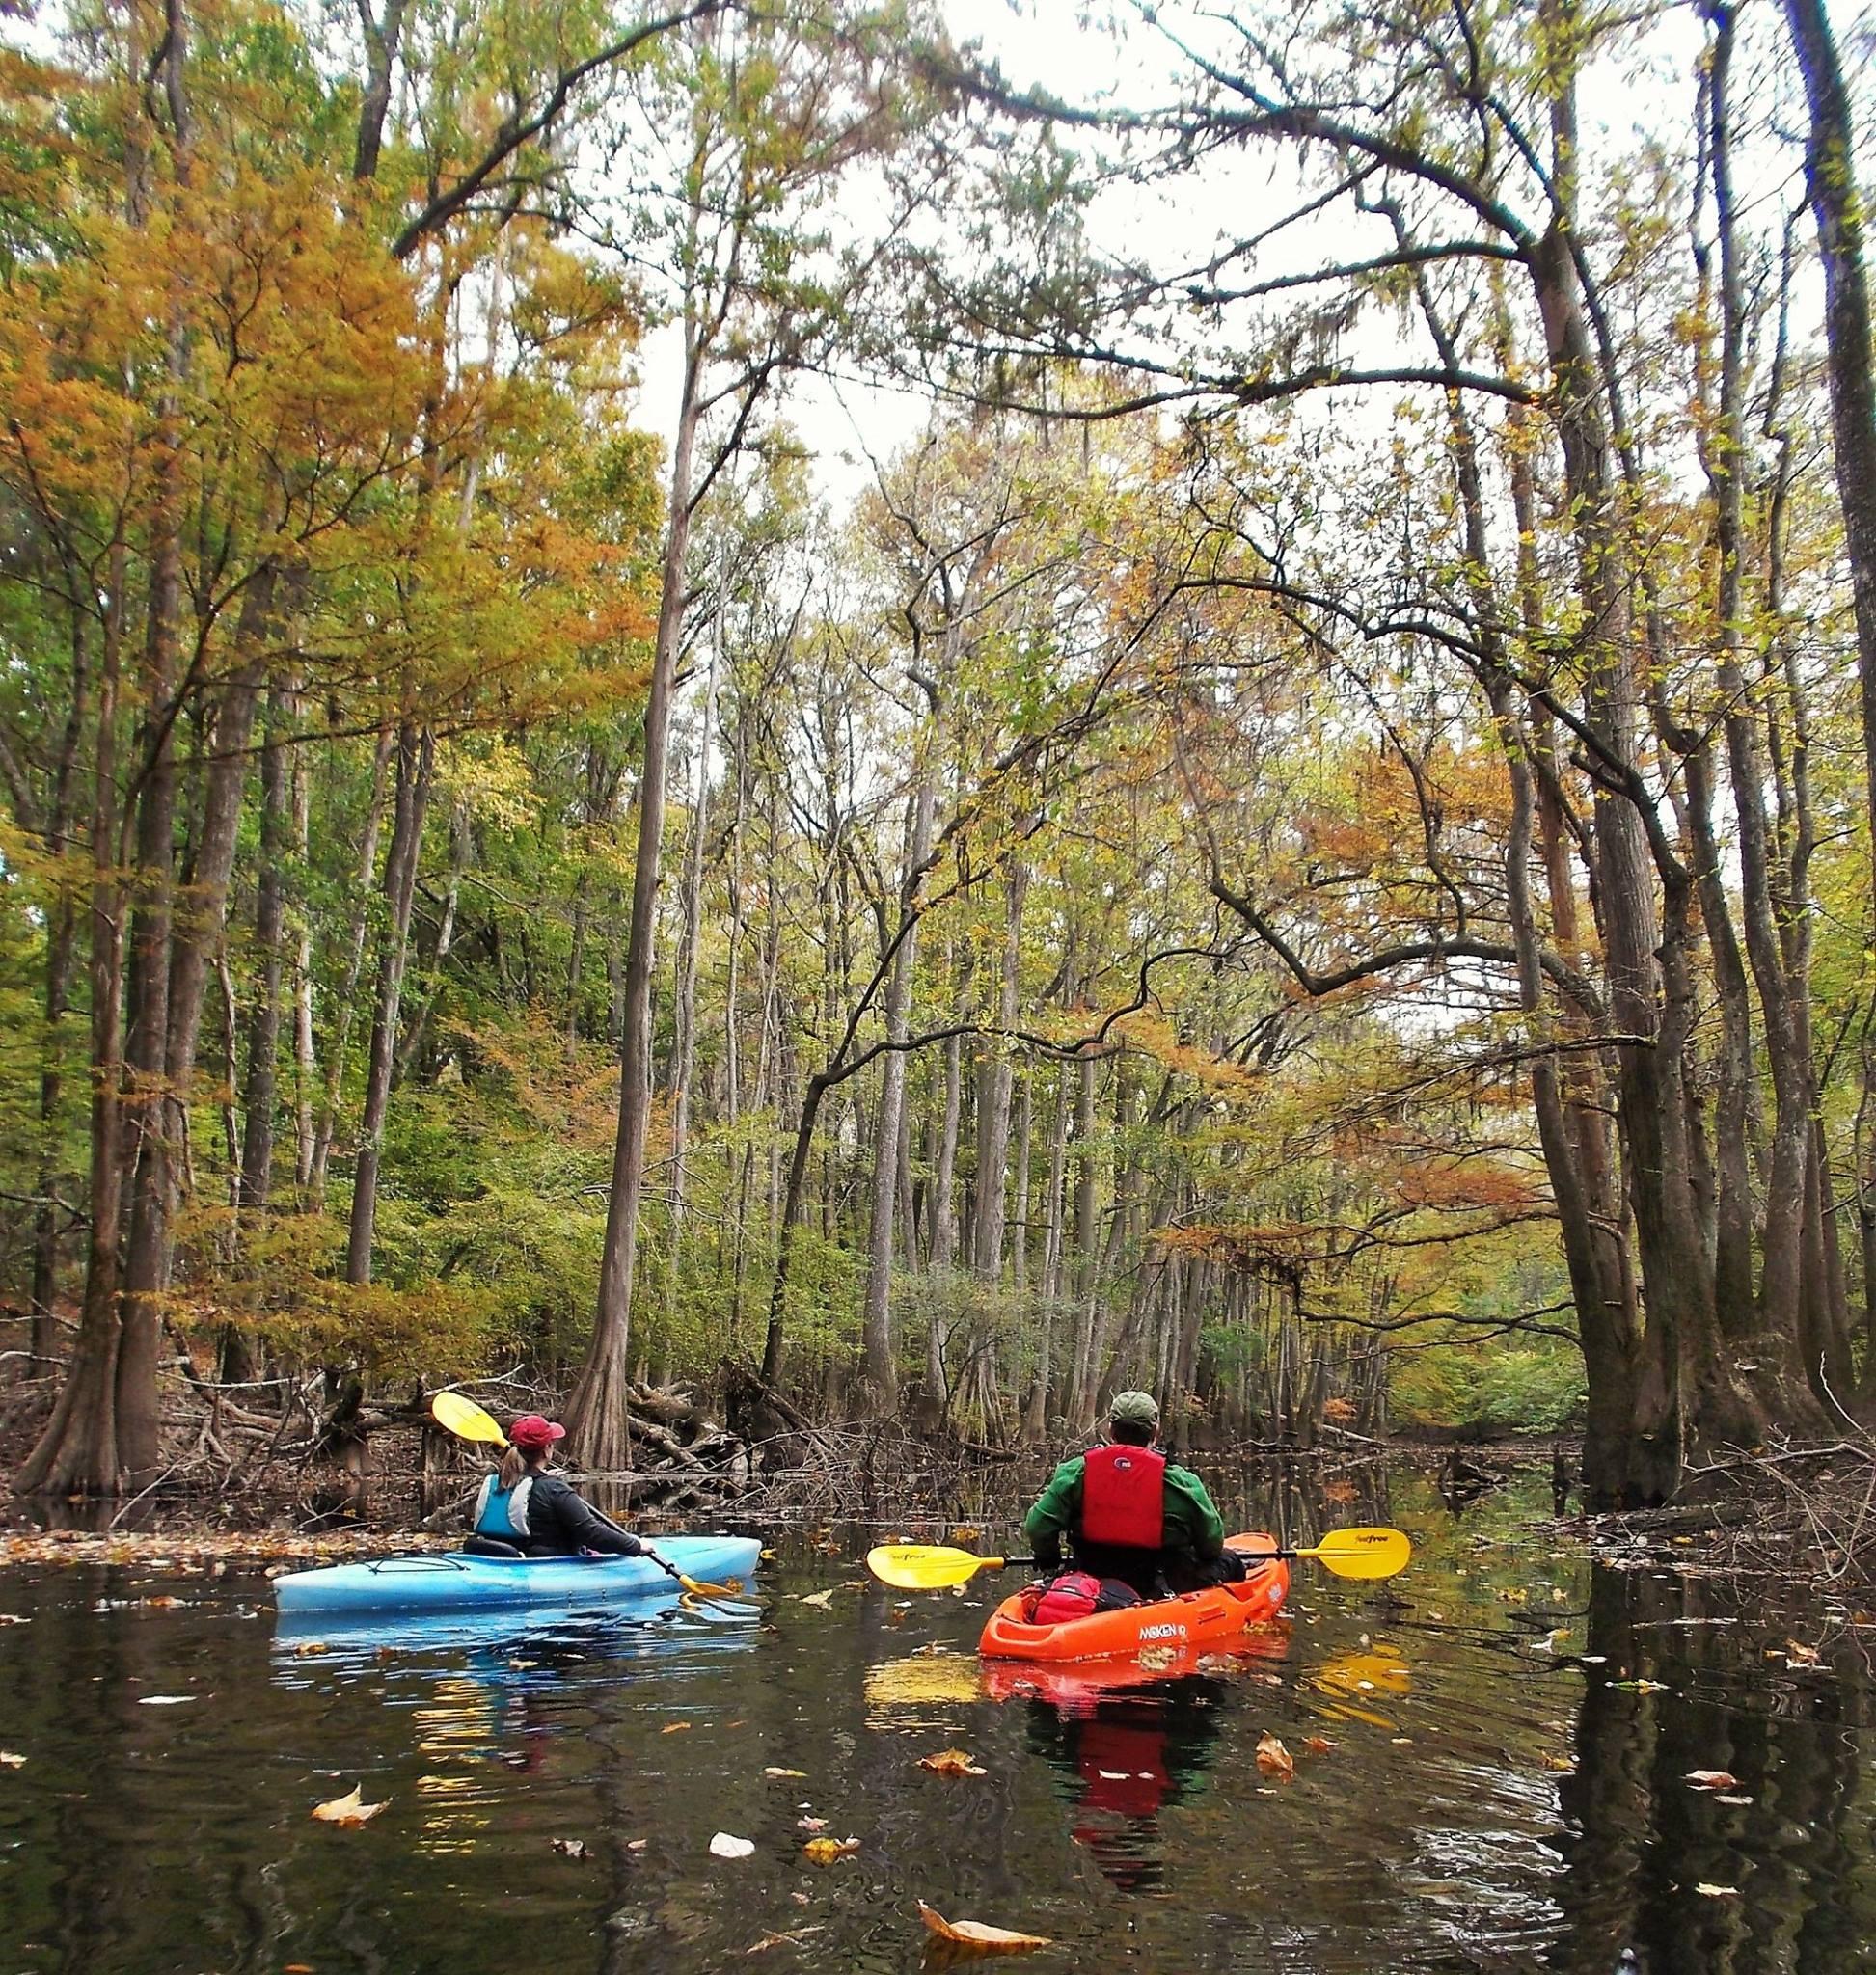 Kayakers on Cedar Creek. Photo by Jtmartin57